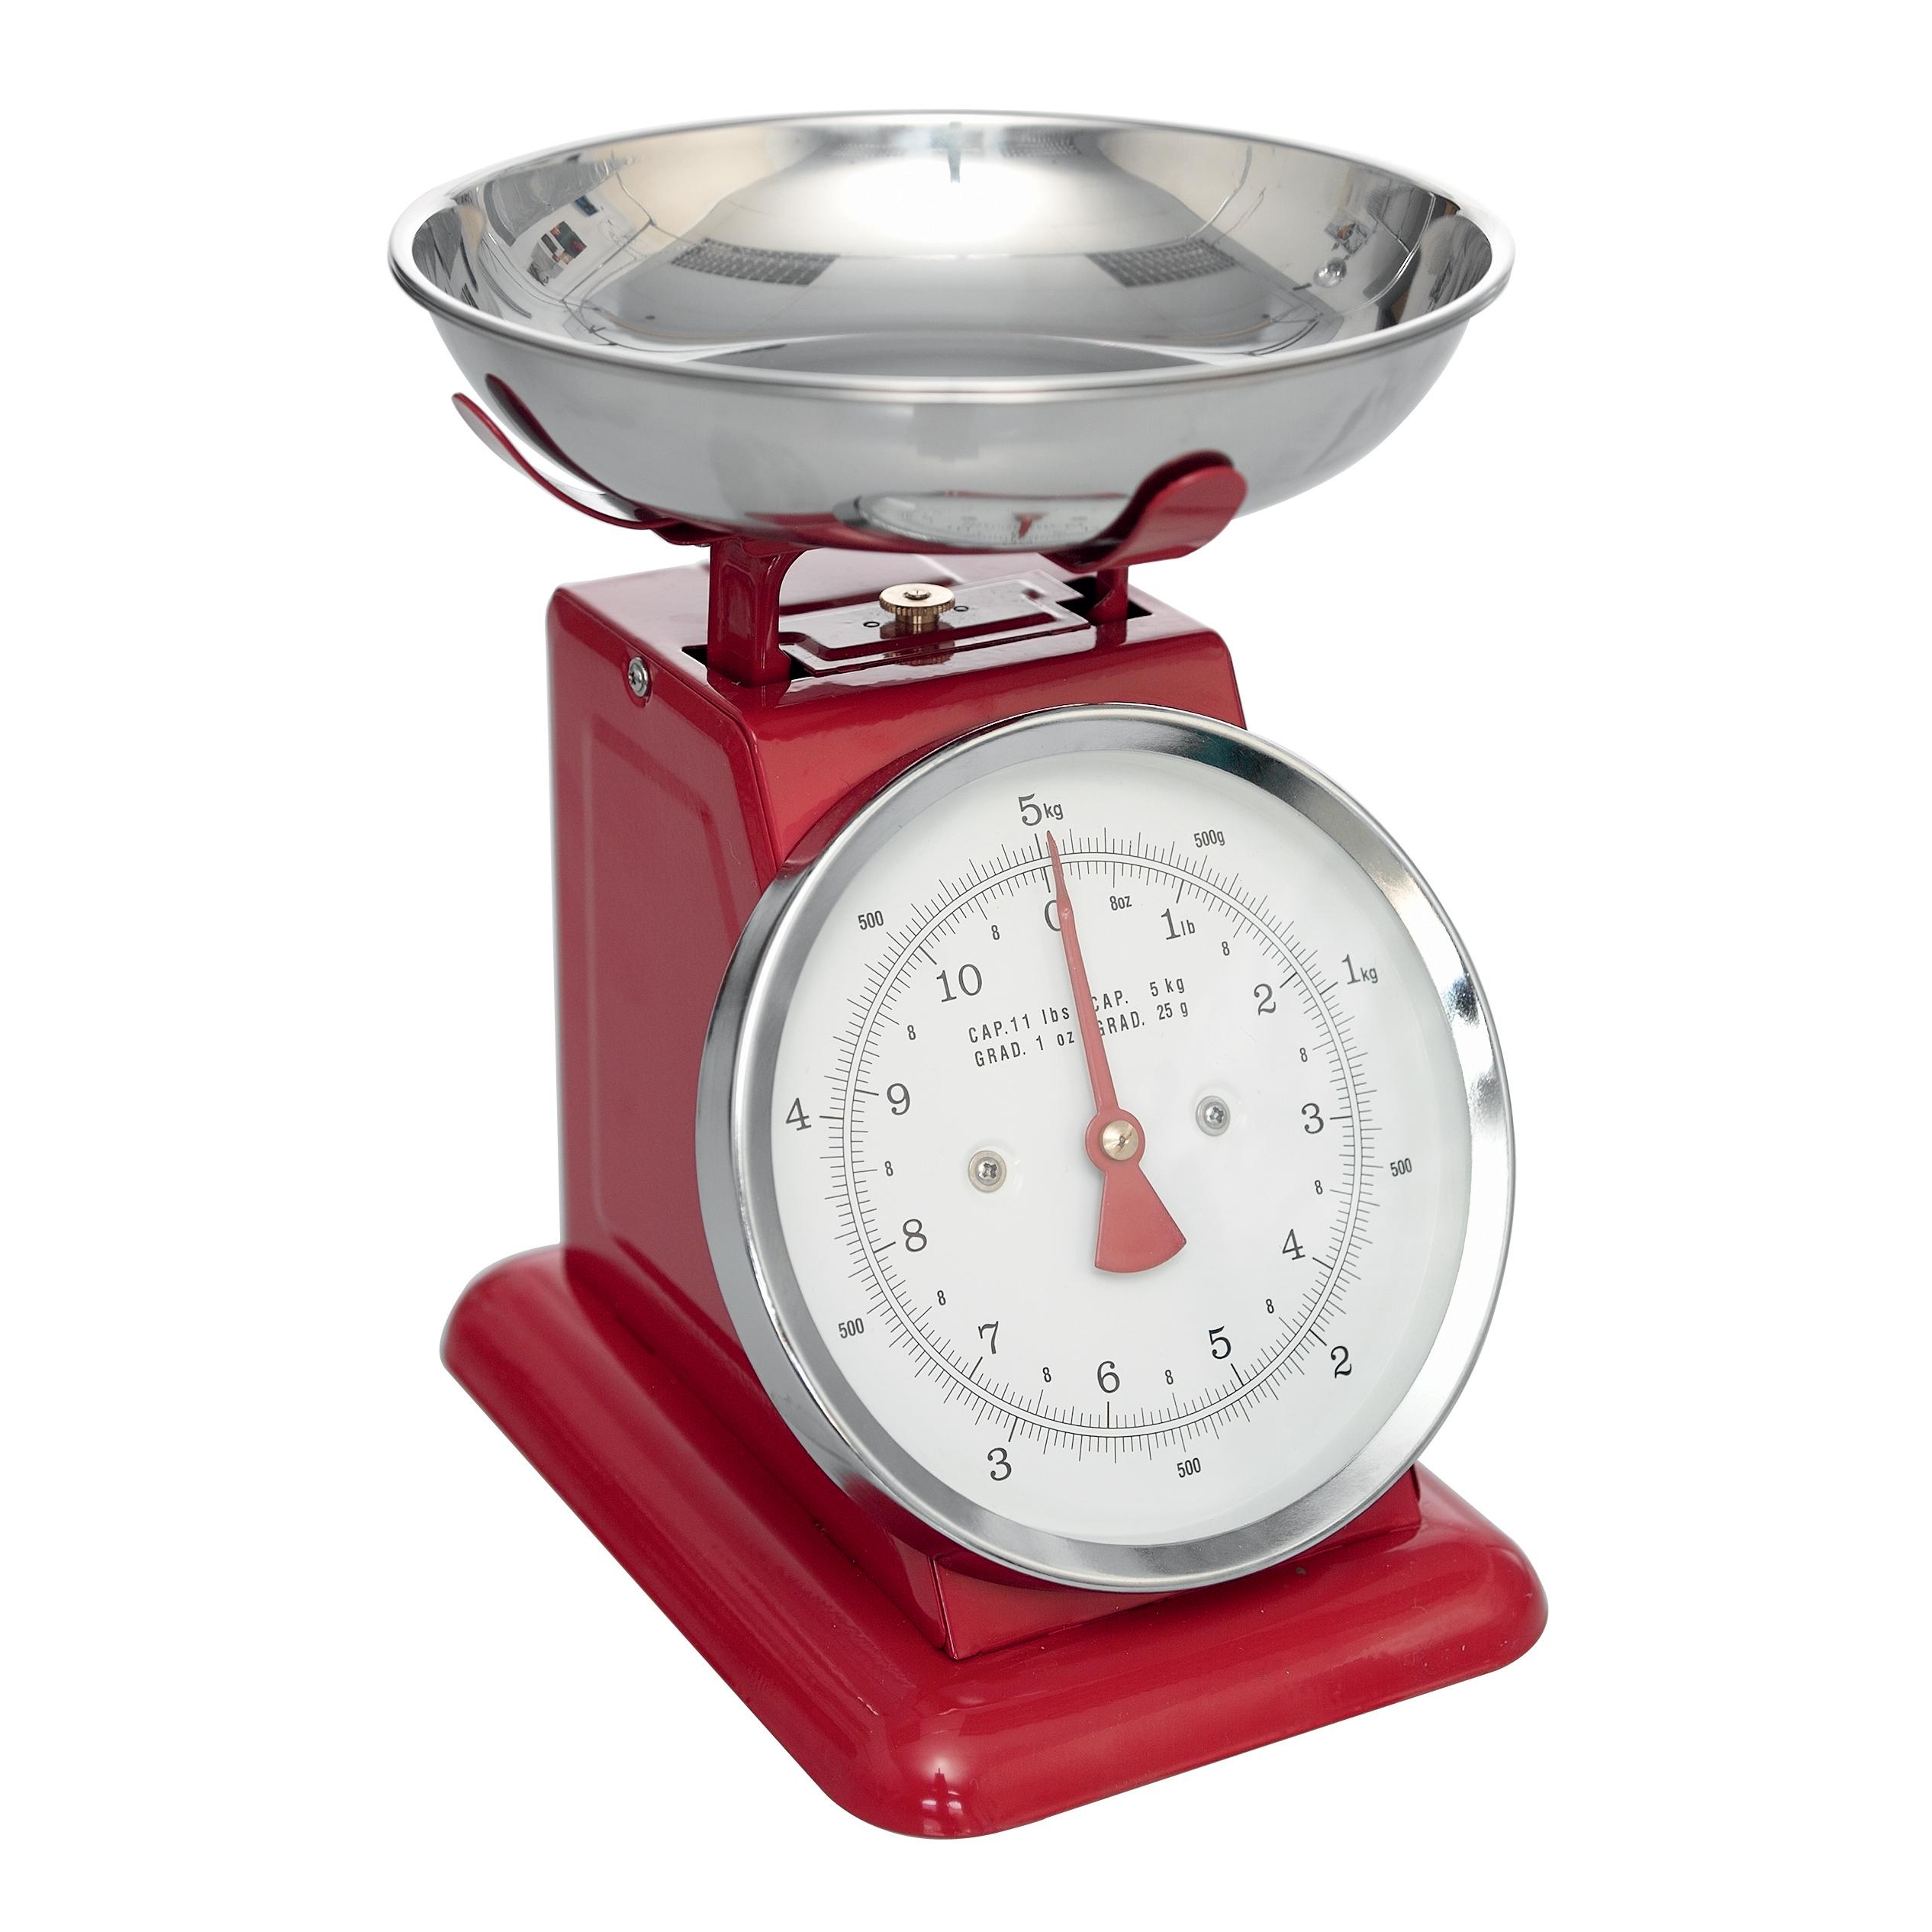 Red Kitchen Scales dotcomgiftshop